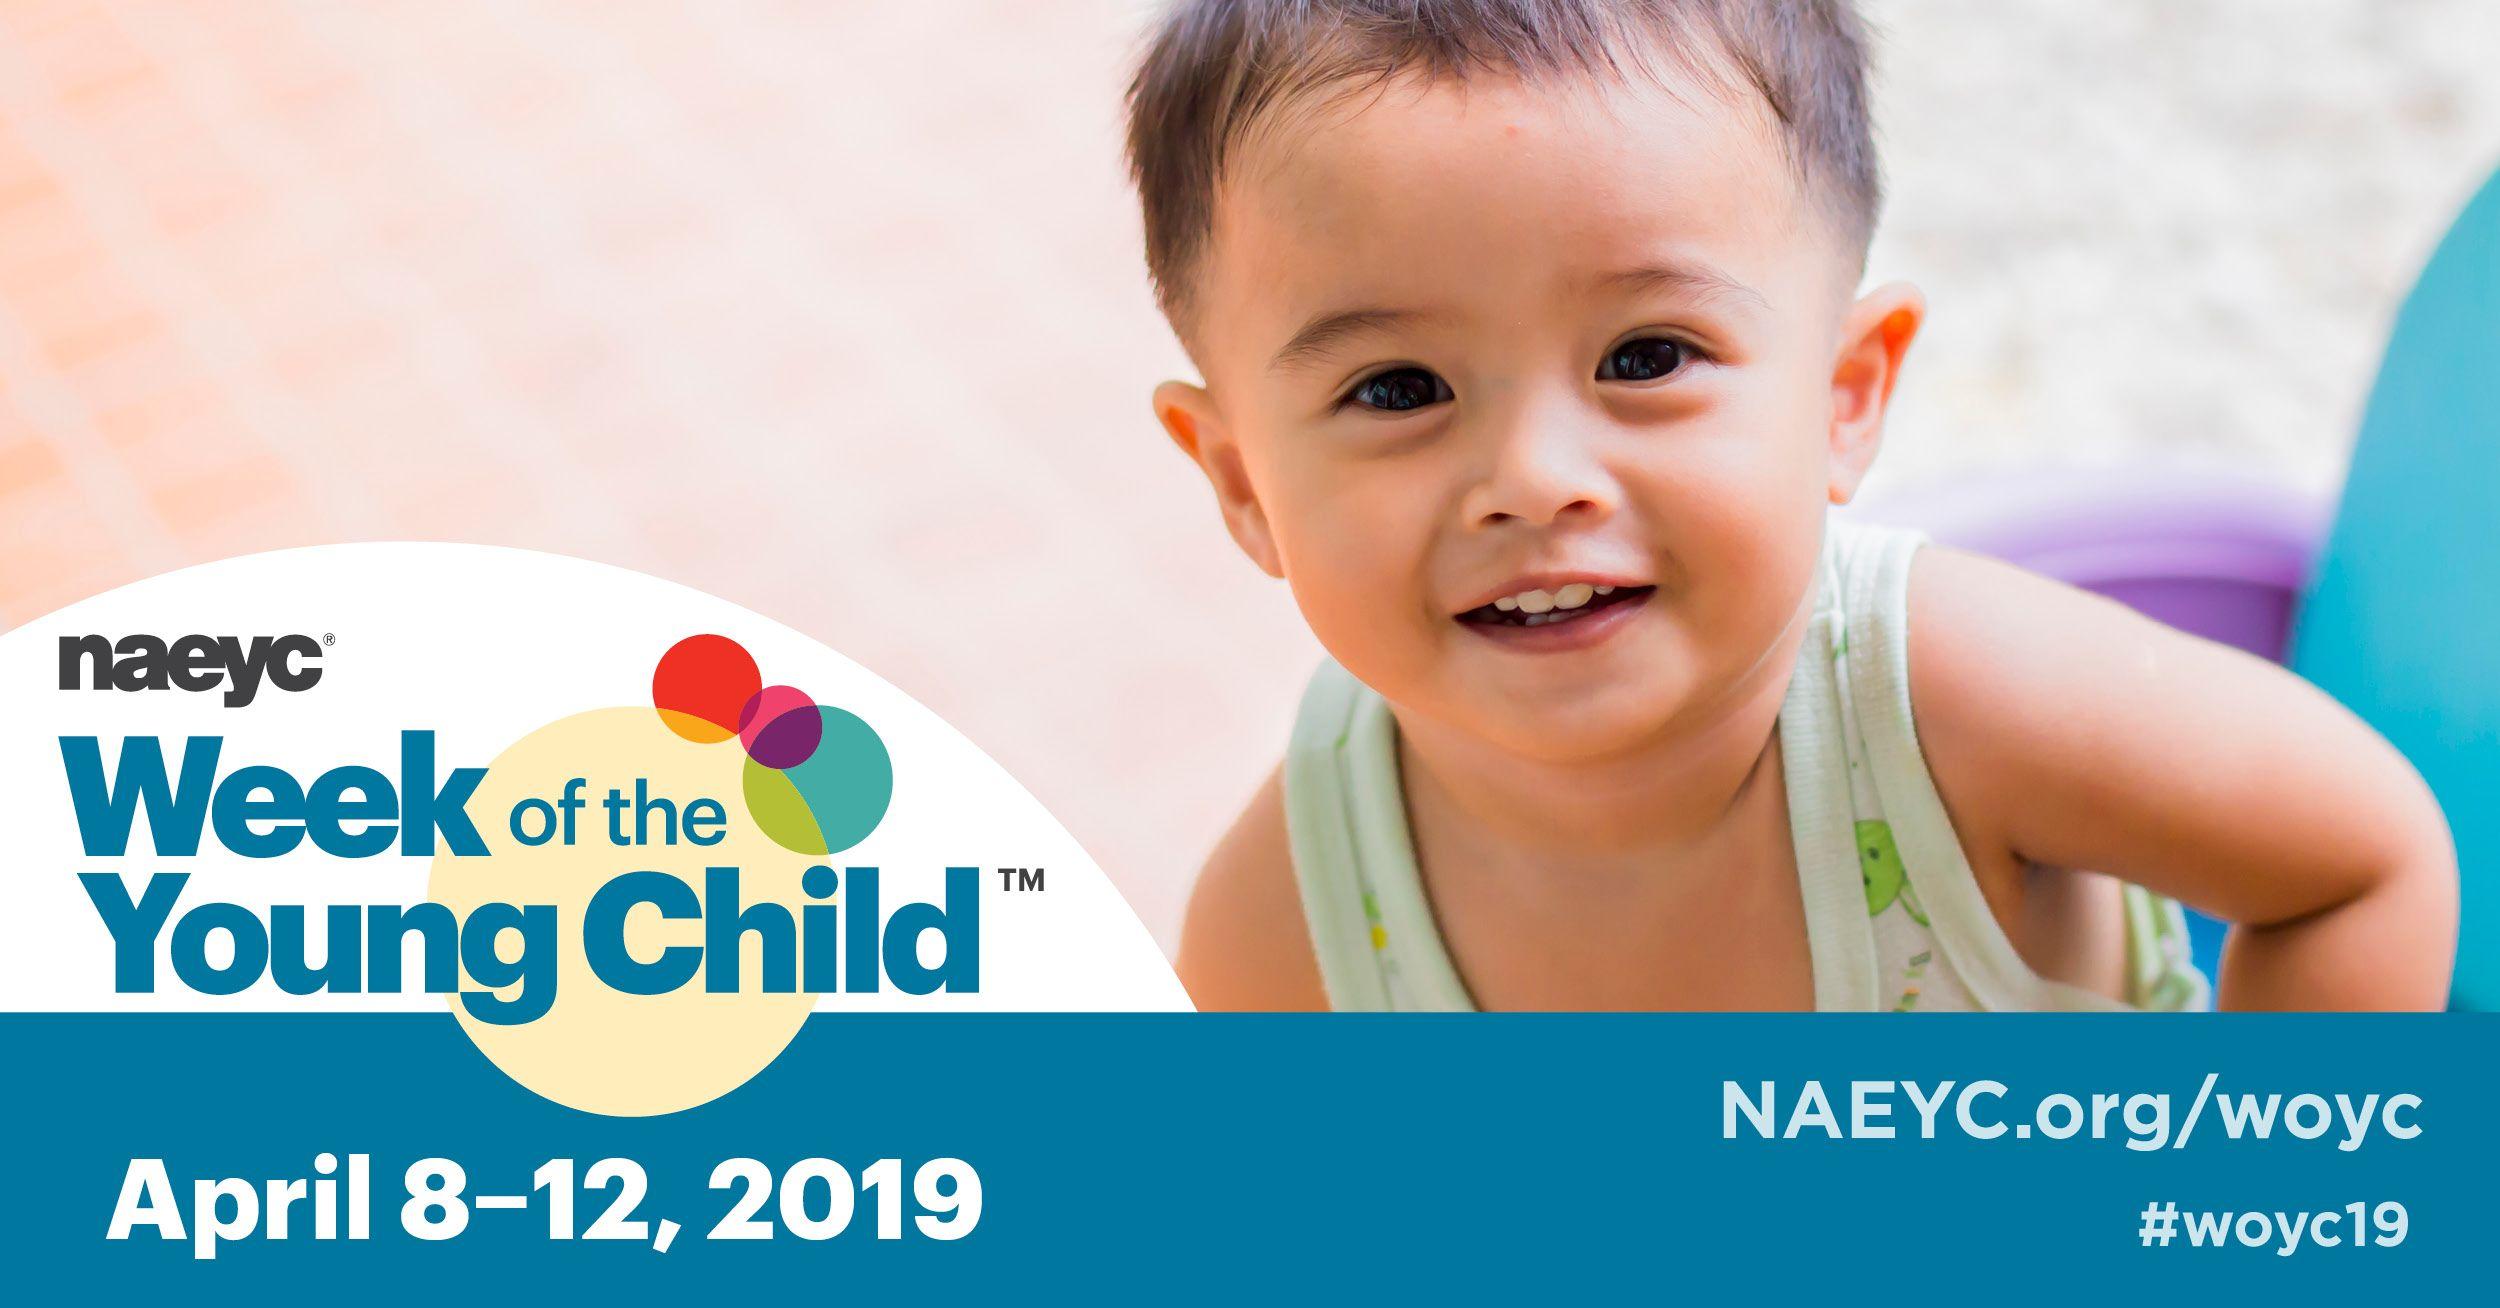 Visit NAEYC org/woyc to plan your celebration! | 2019 Week